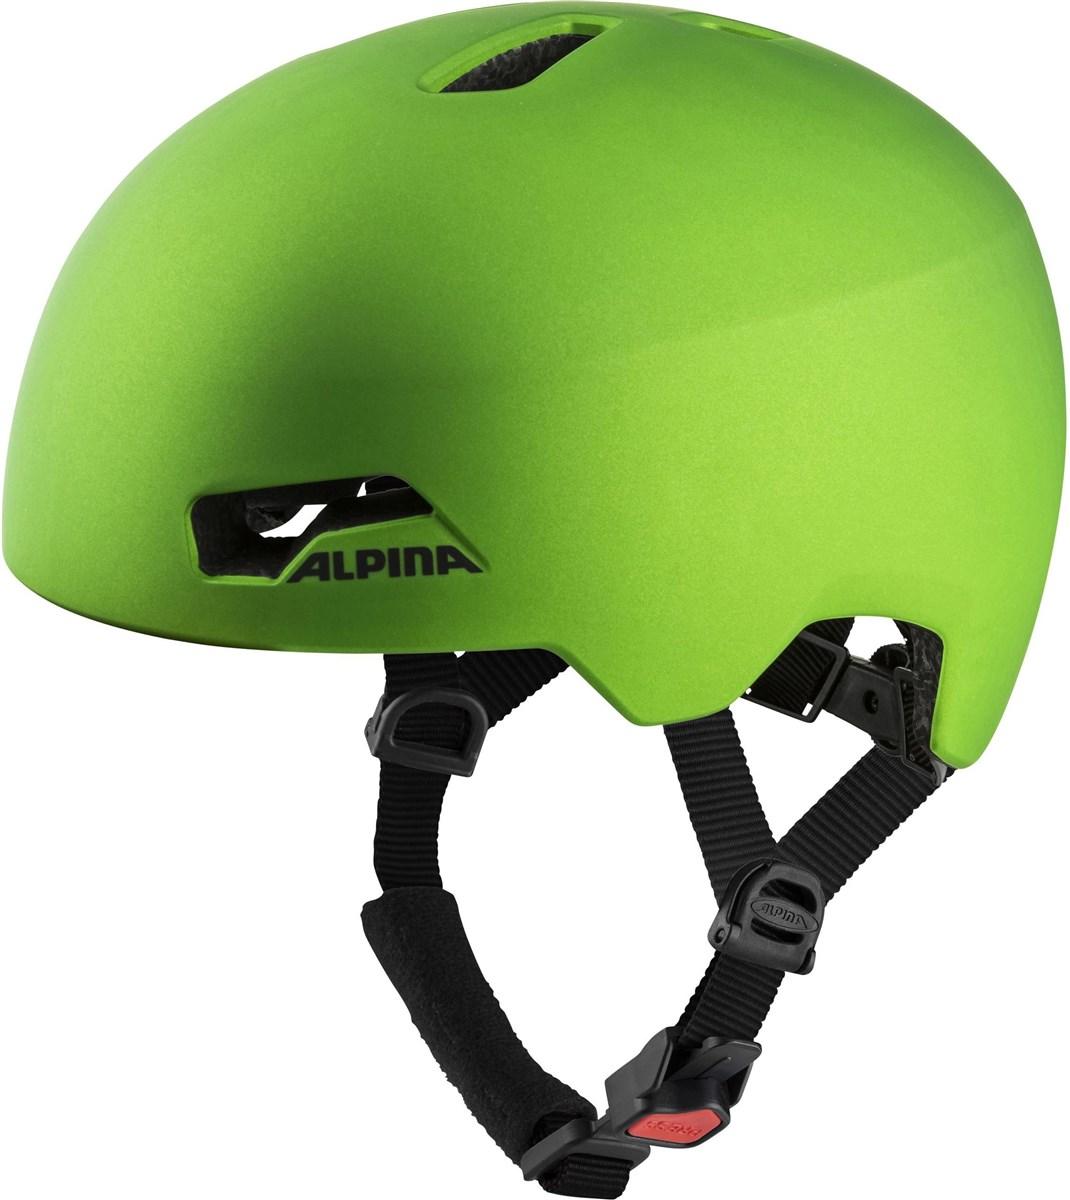 Alpina Hackney BMX / Skate Helmet | bike helmet